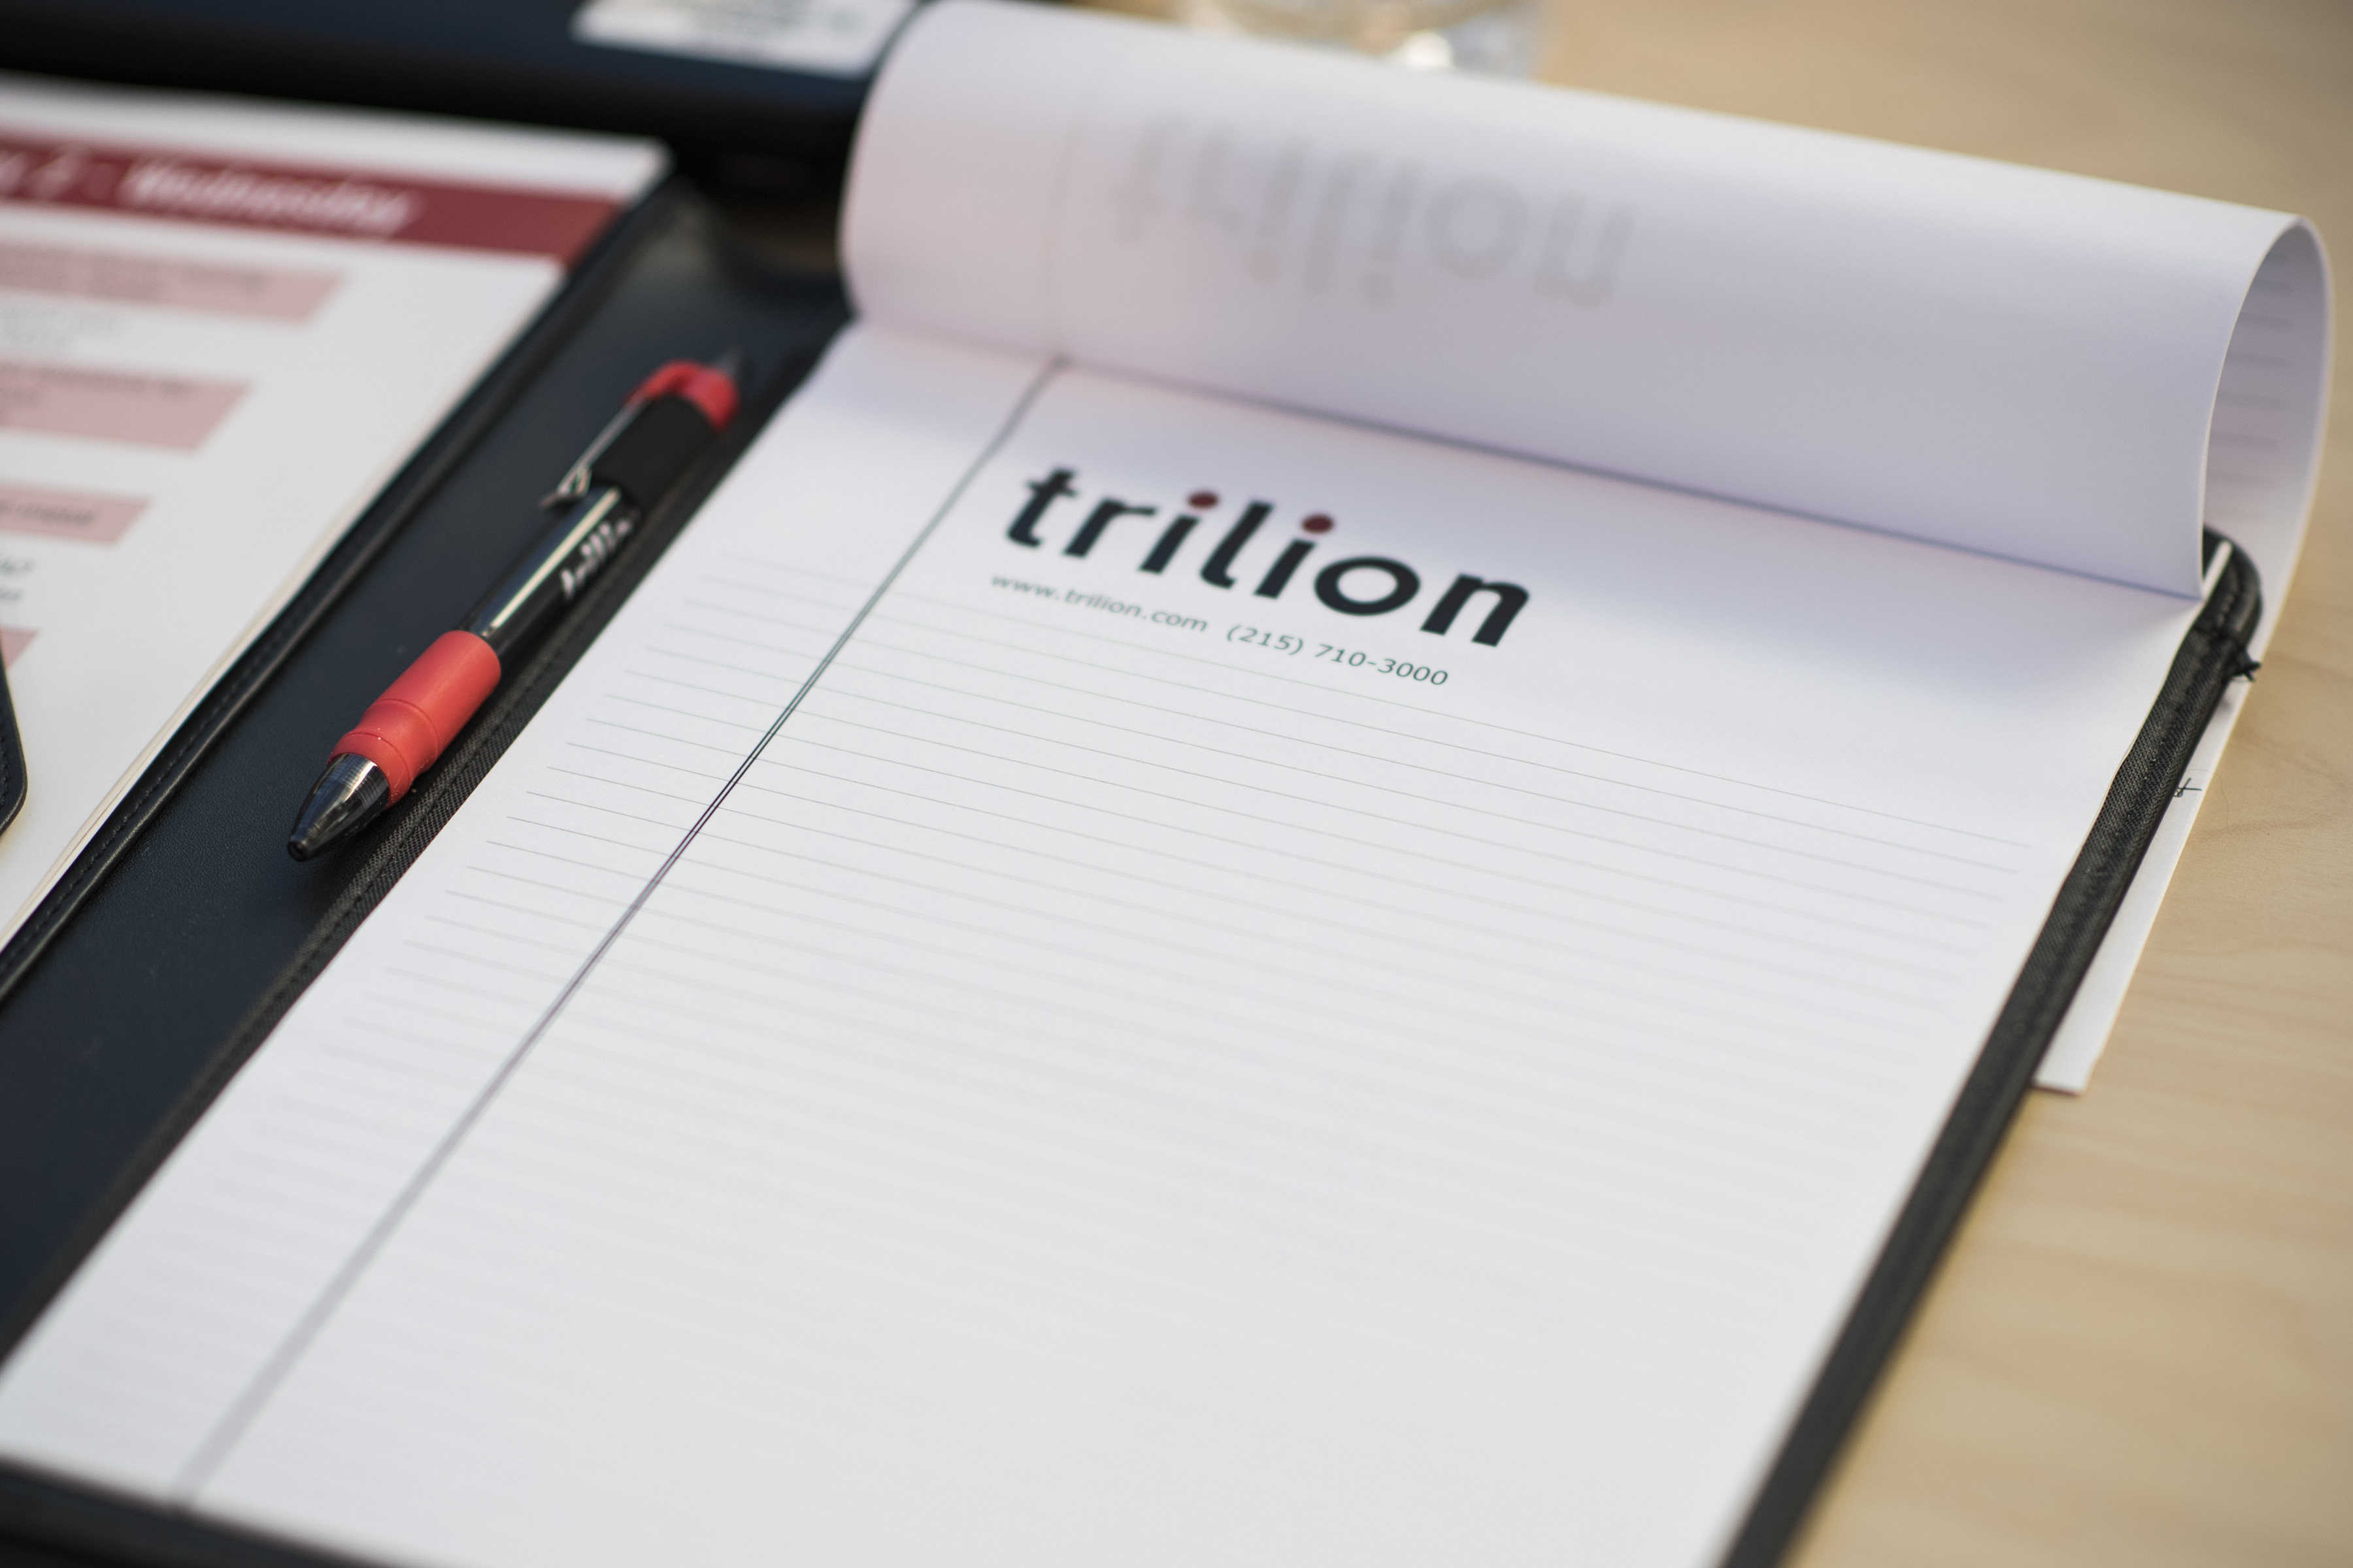 Photo of Trilion Note pad